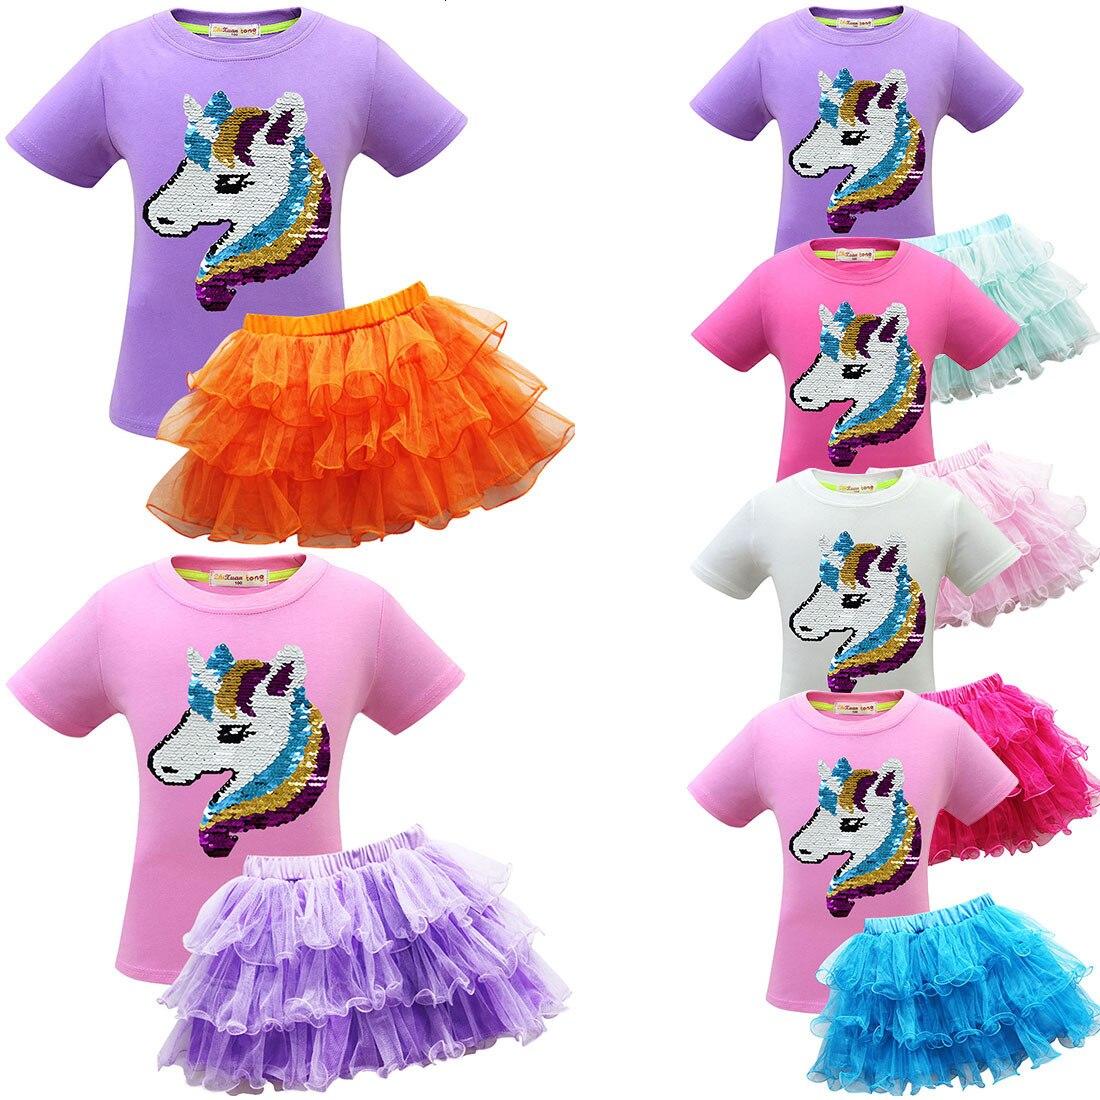 22019 Unicorn Unicorn Children Suit Baby Suit Skirt Short Sleeve Thick And Disorderly Skirt